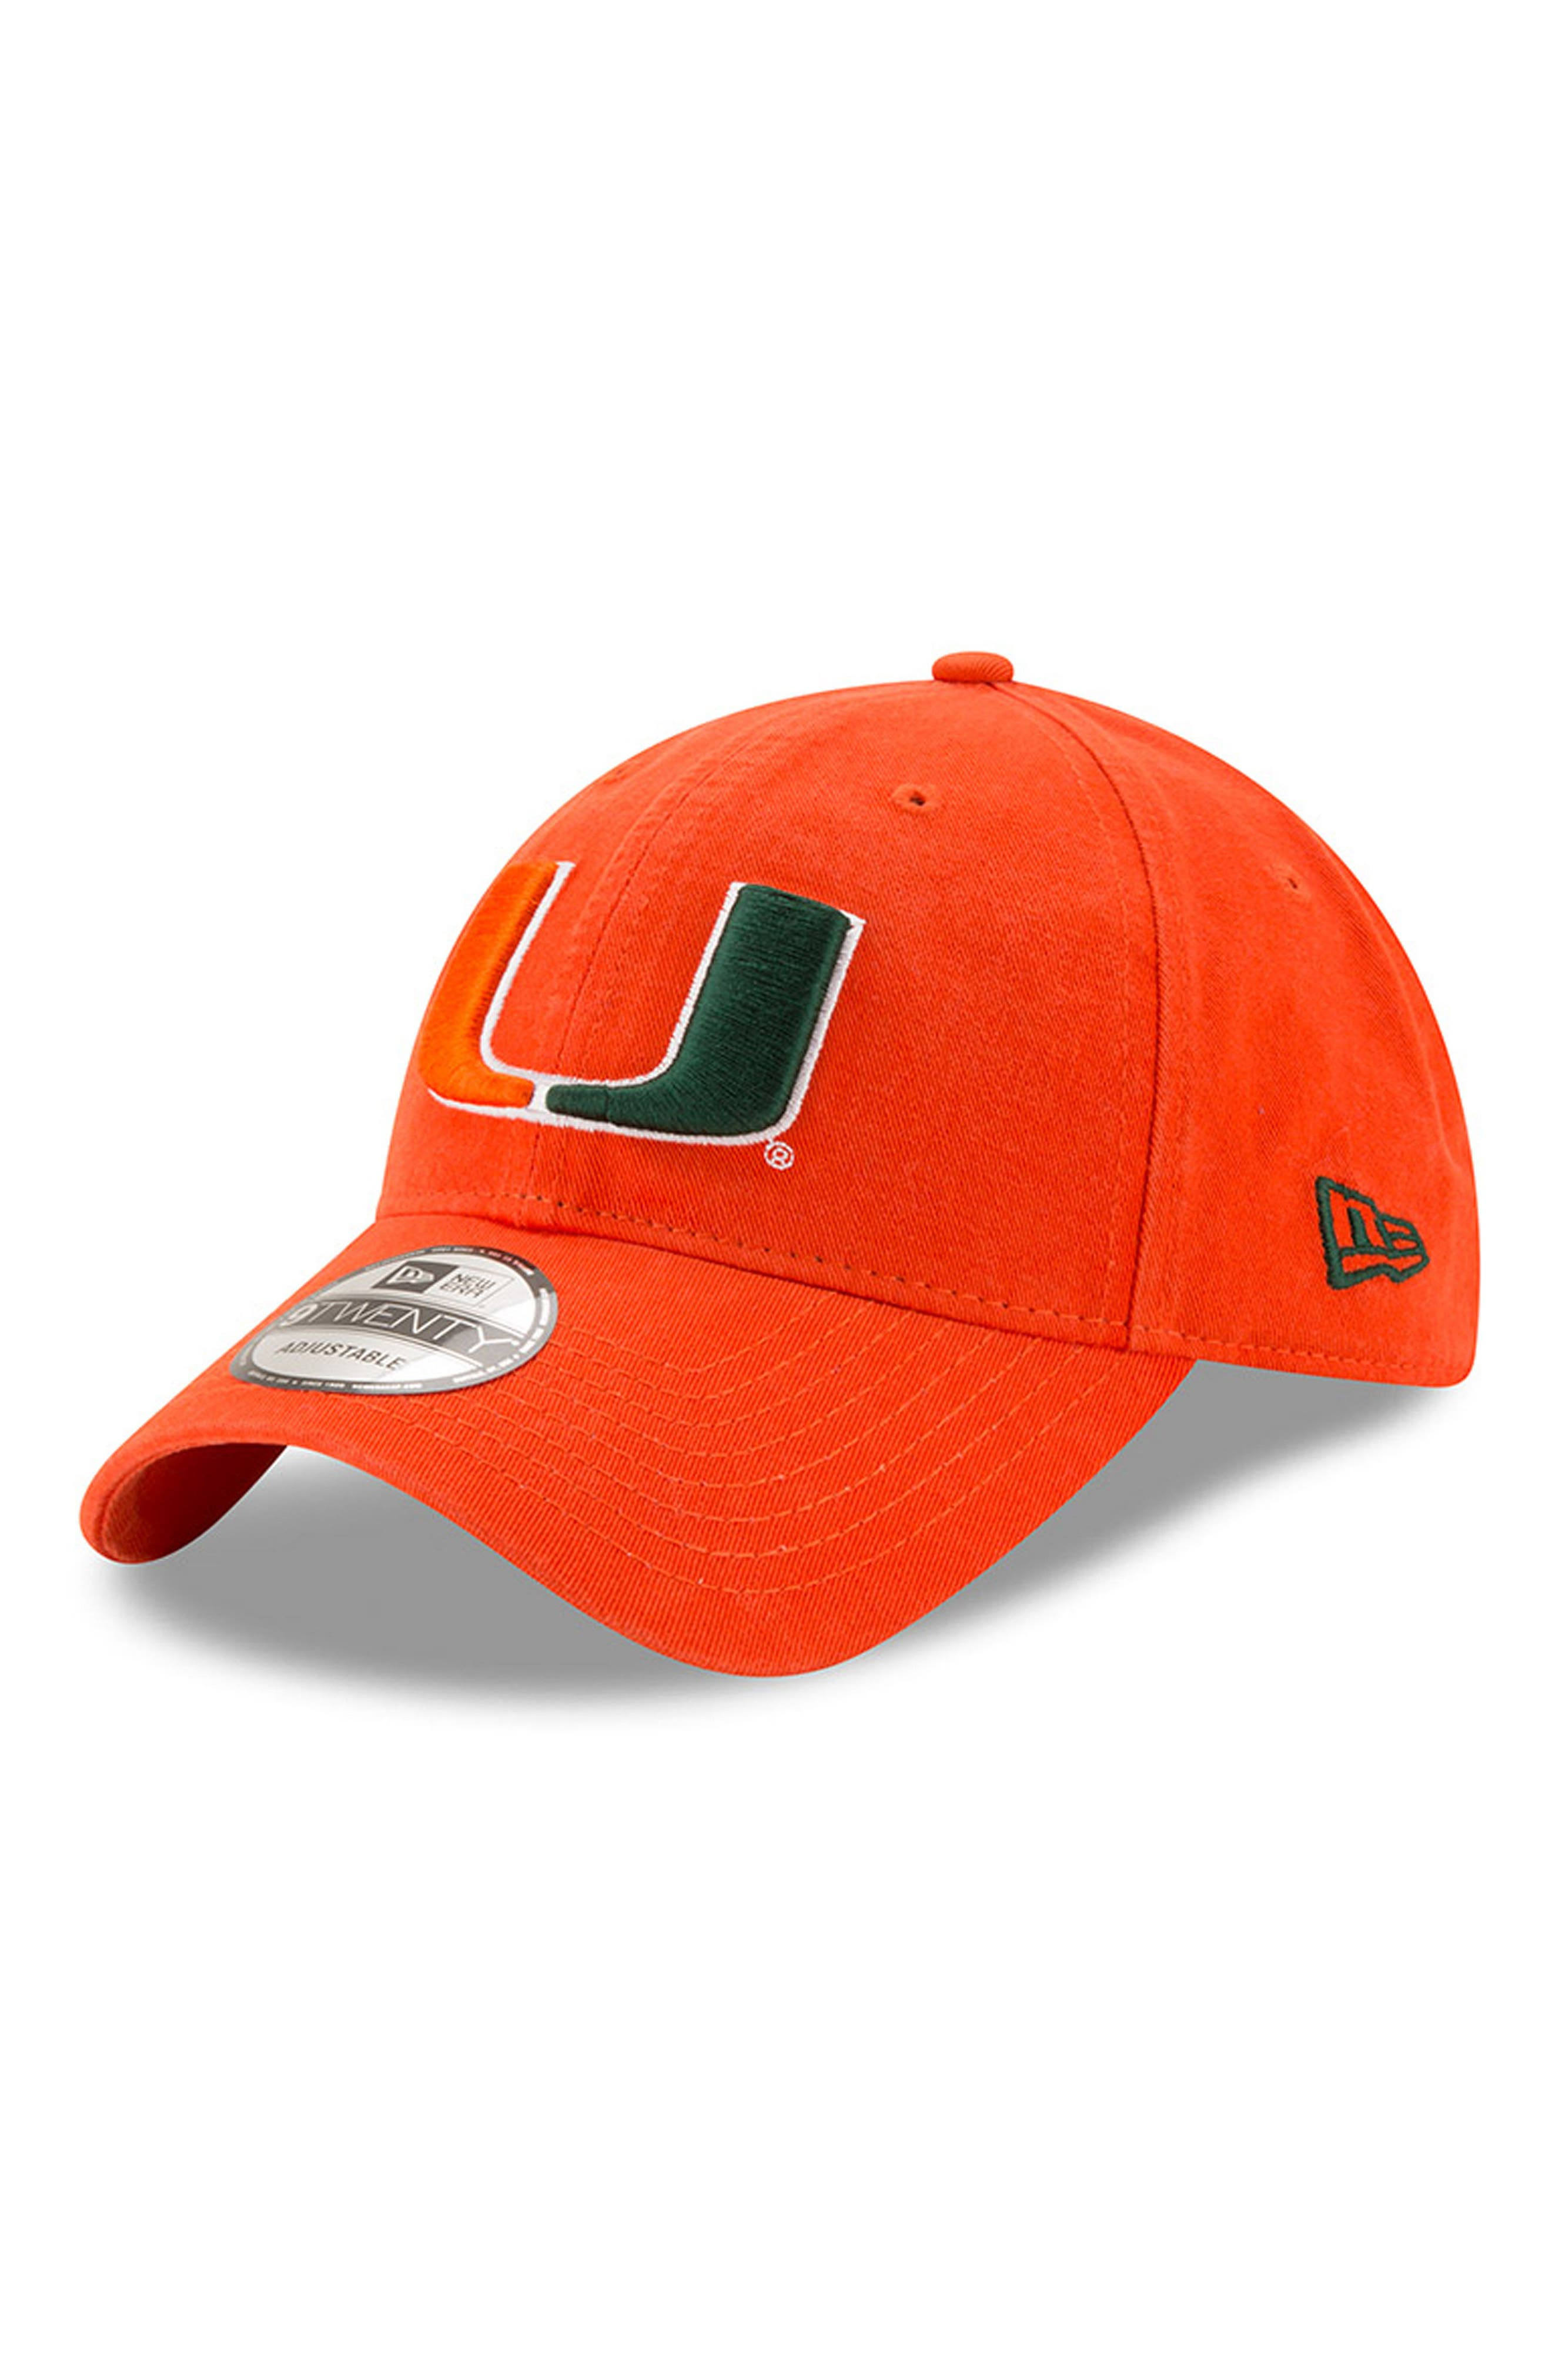 New Era Collegiate Core Classic - Miami Hurricanes Baseball Cap,                             Main thumbnail 1, color,